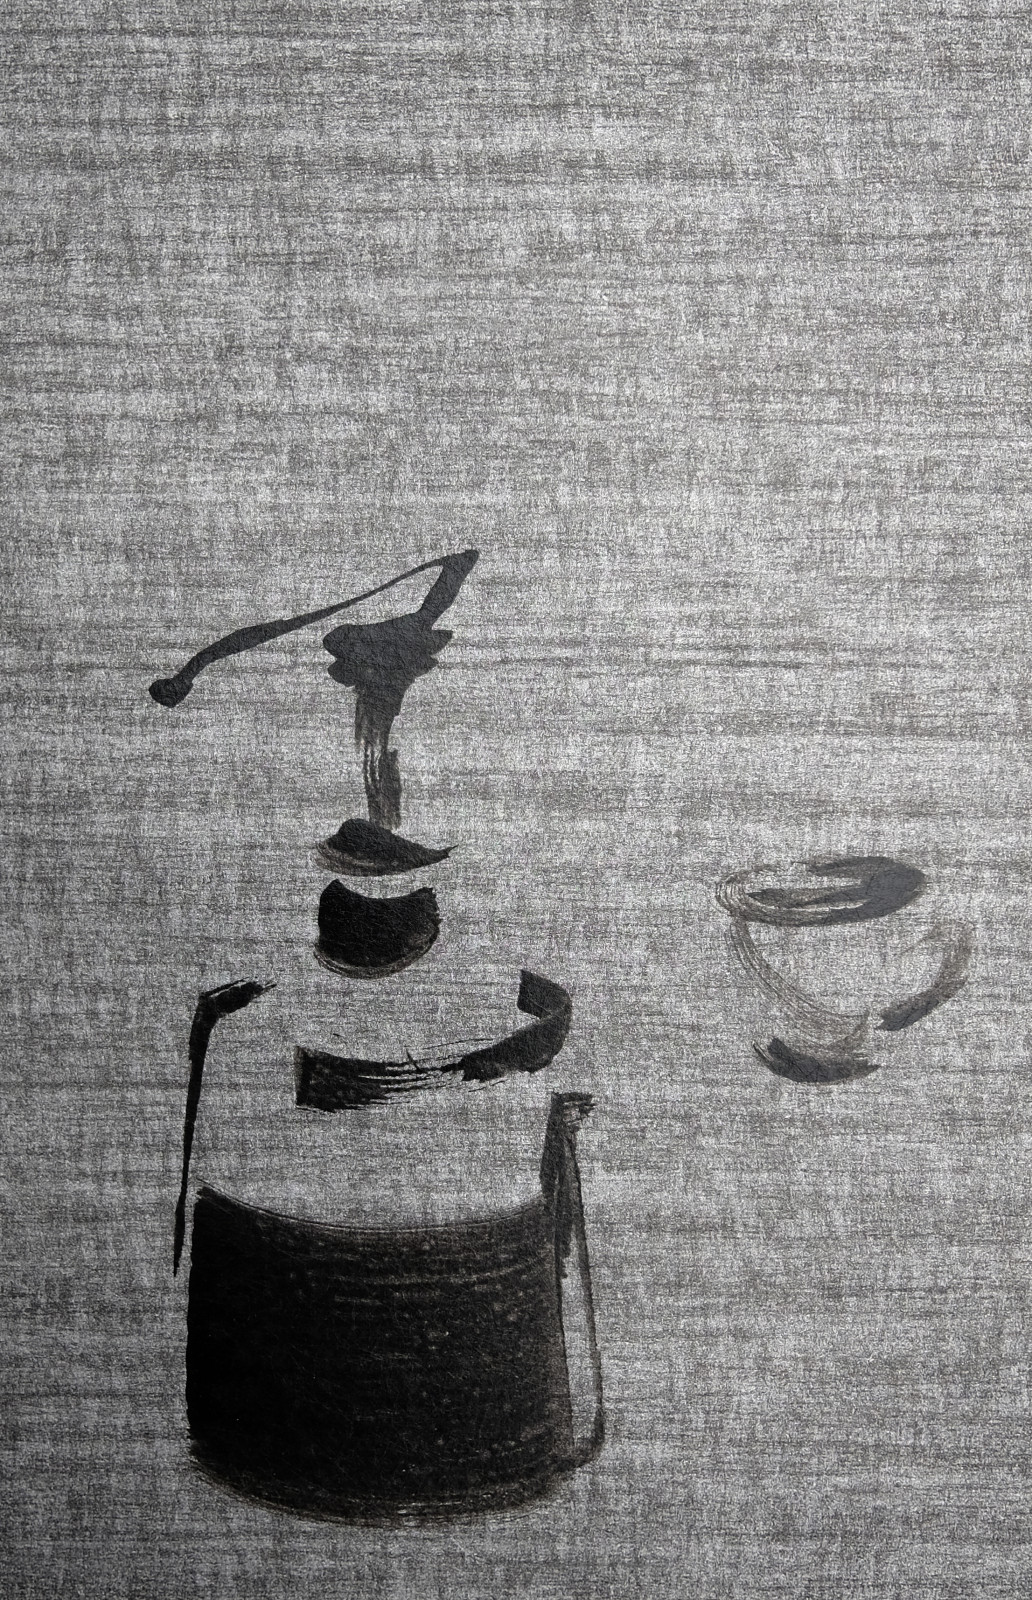 Koetzier van Hooff   Wallpaper Series   Still Life on raw Grey